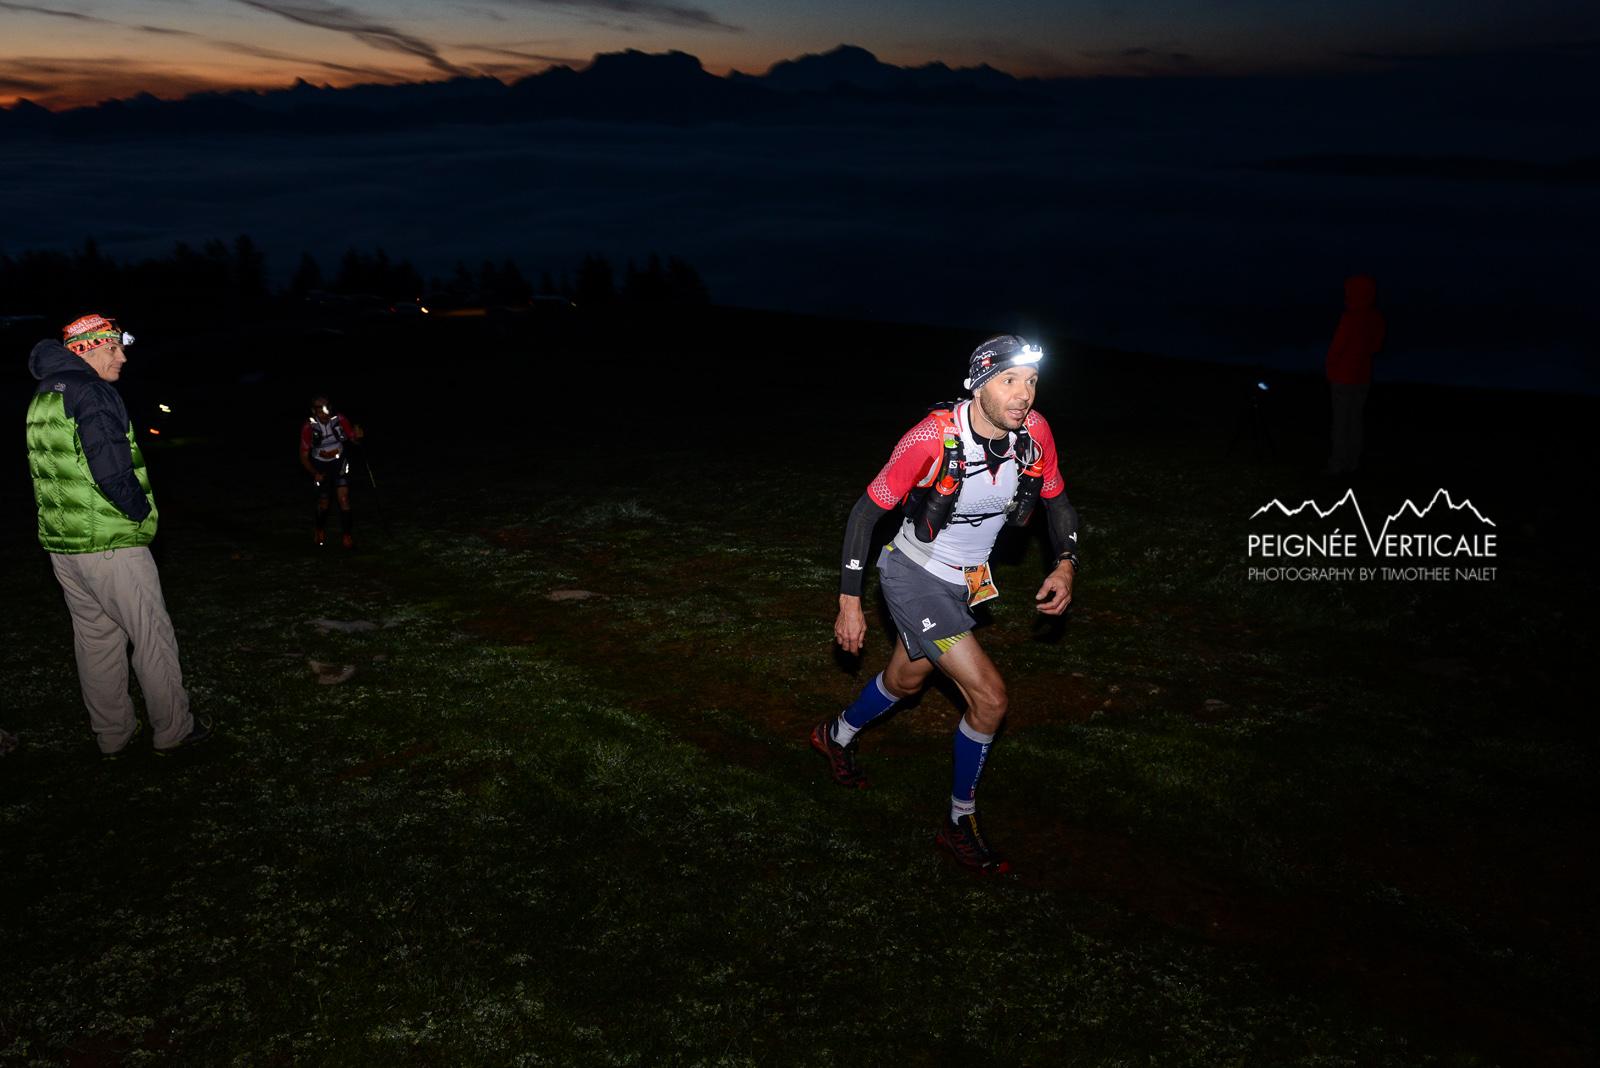 MaxiRace-Annecy-2014-Team-Hoka-Timothee-Nalet-0724.jpg